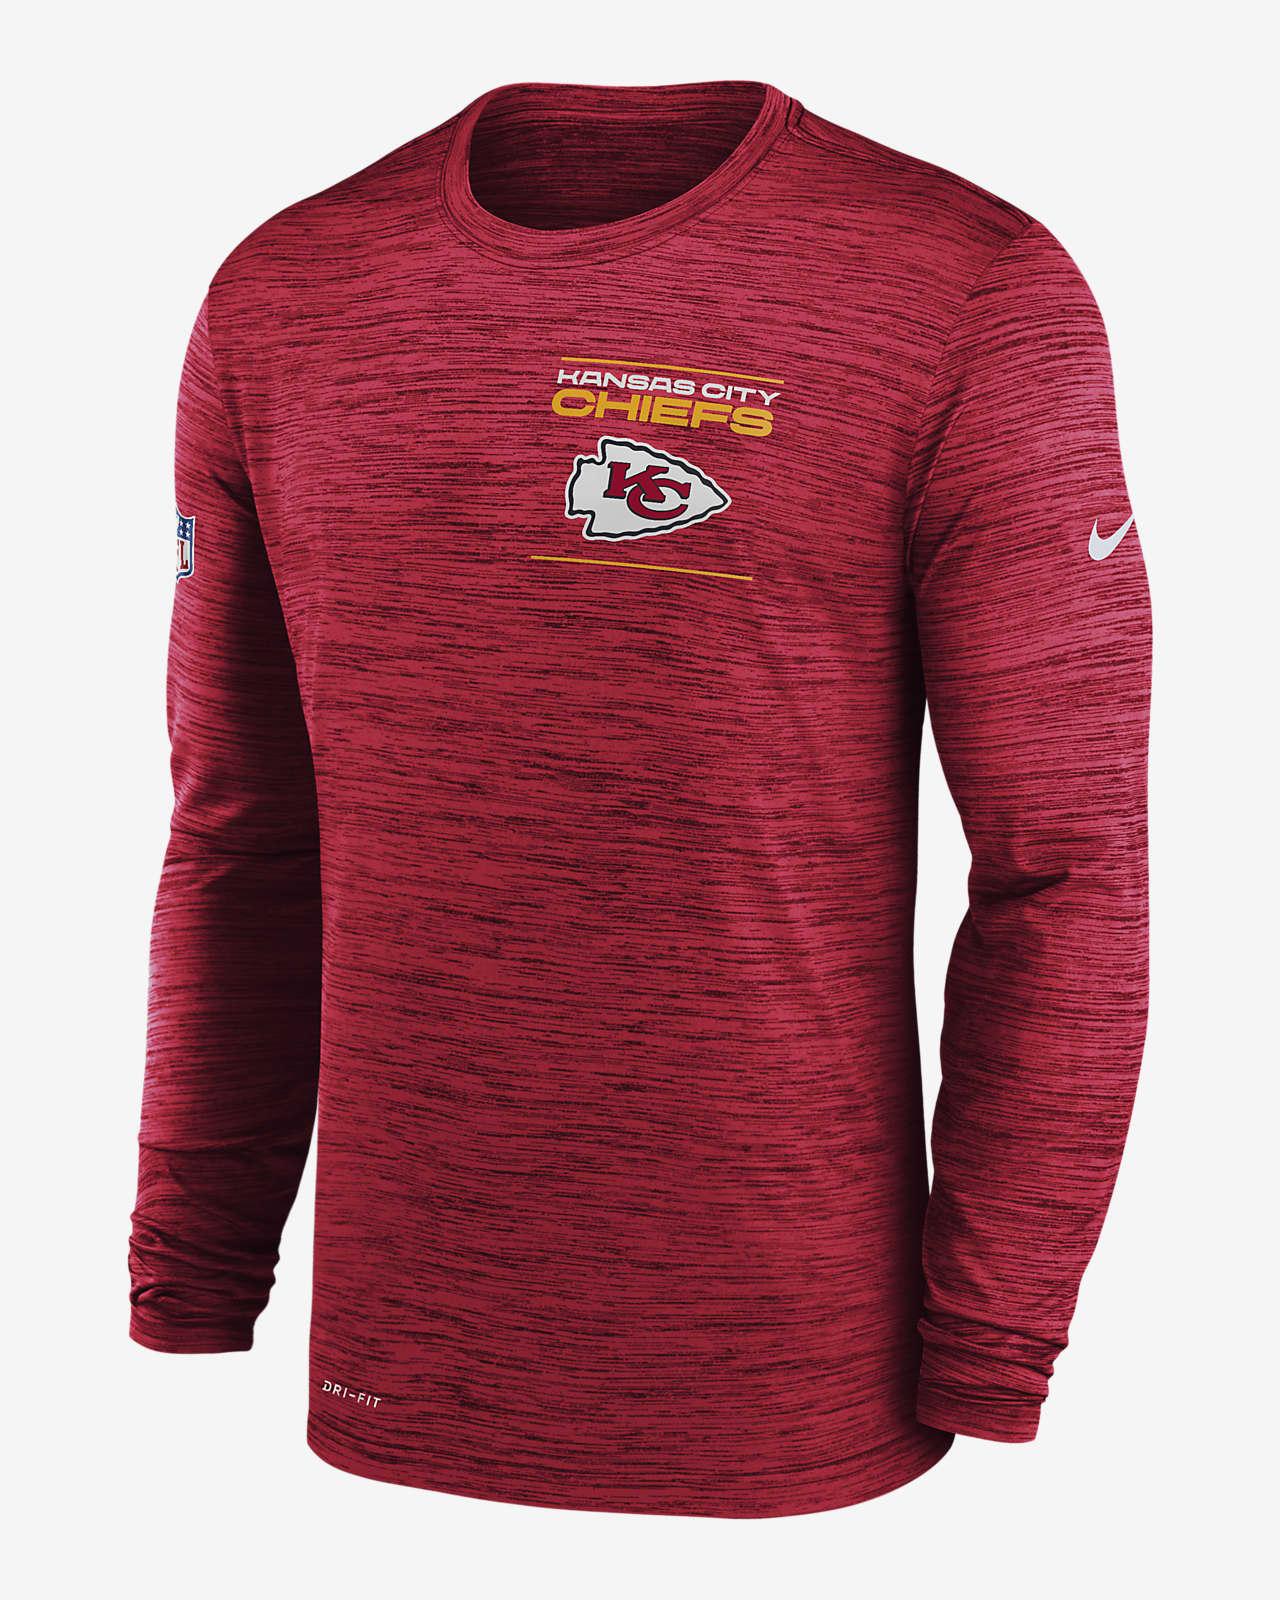 Nike Dri-FIT Sideline Velocity Legend (NFL Kansas City Chiefs) Men's Long-Sleeve T-Shirt